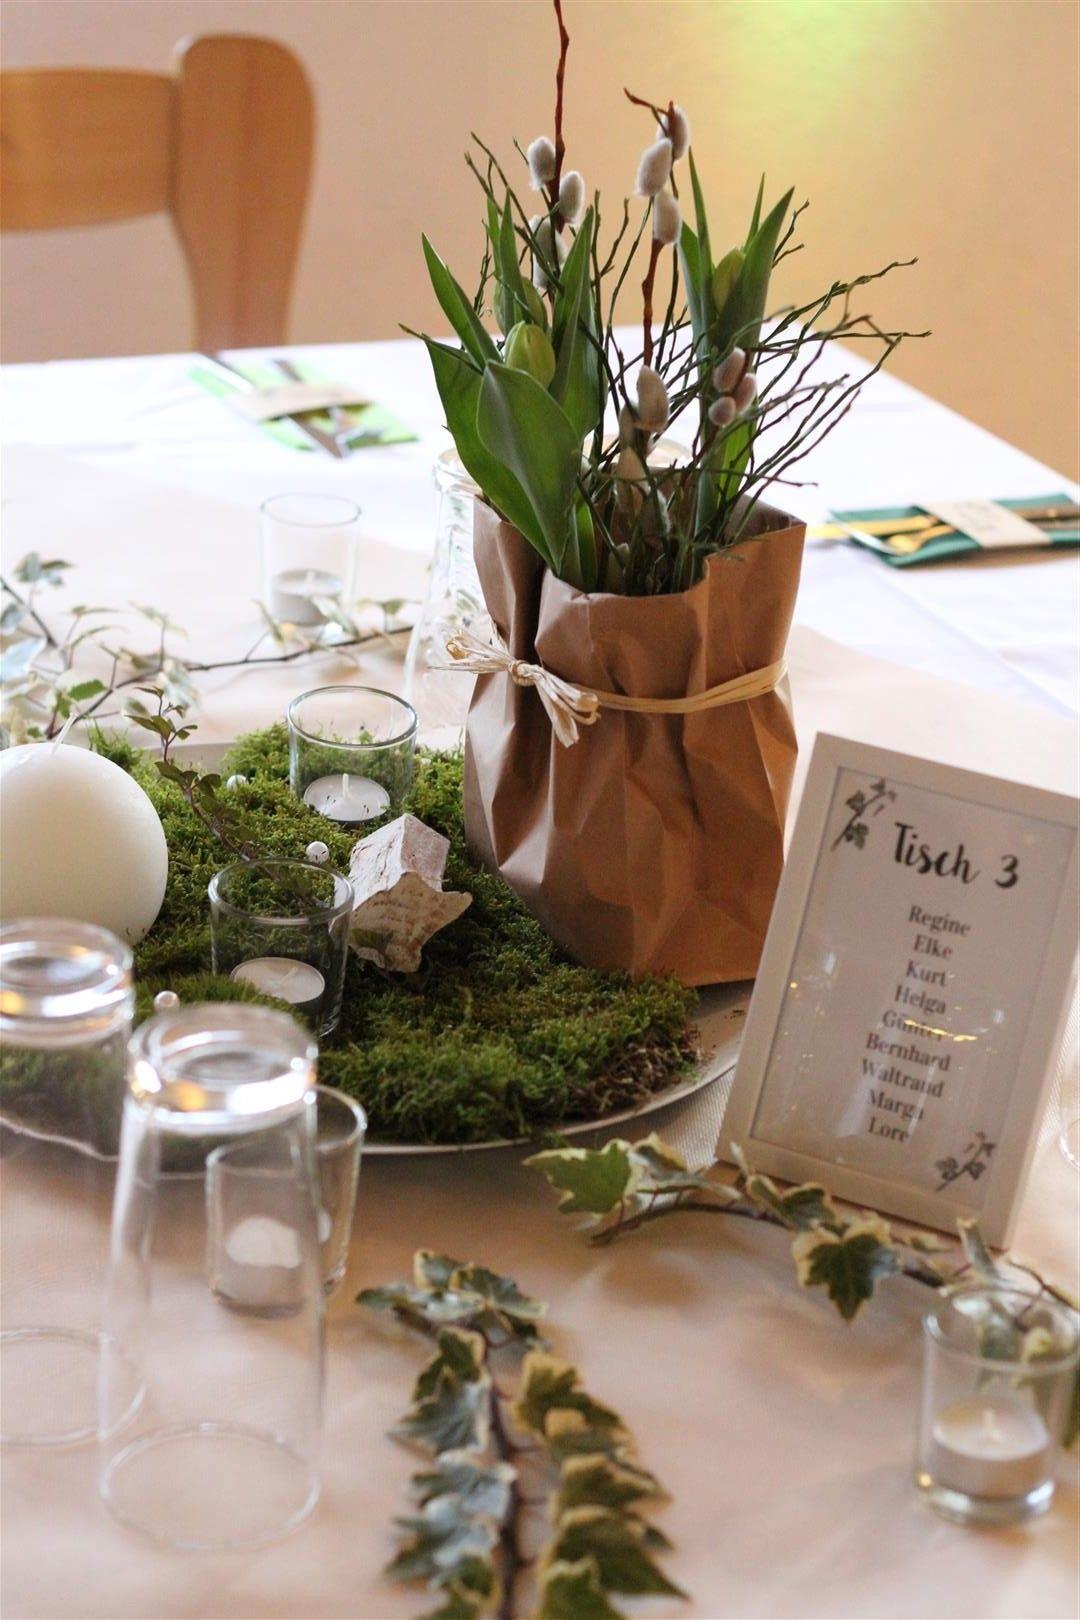 Tischdeko Taufe Basteln 1 Tischdeko Hochzeit Ehrenplatz Deko Rosen